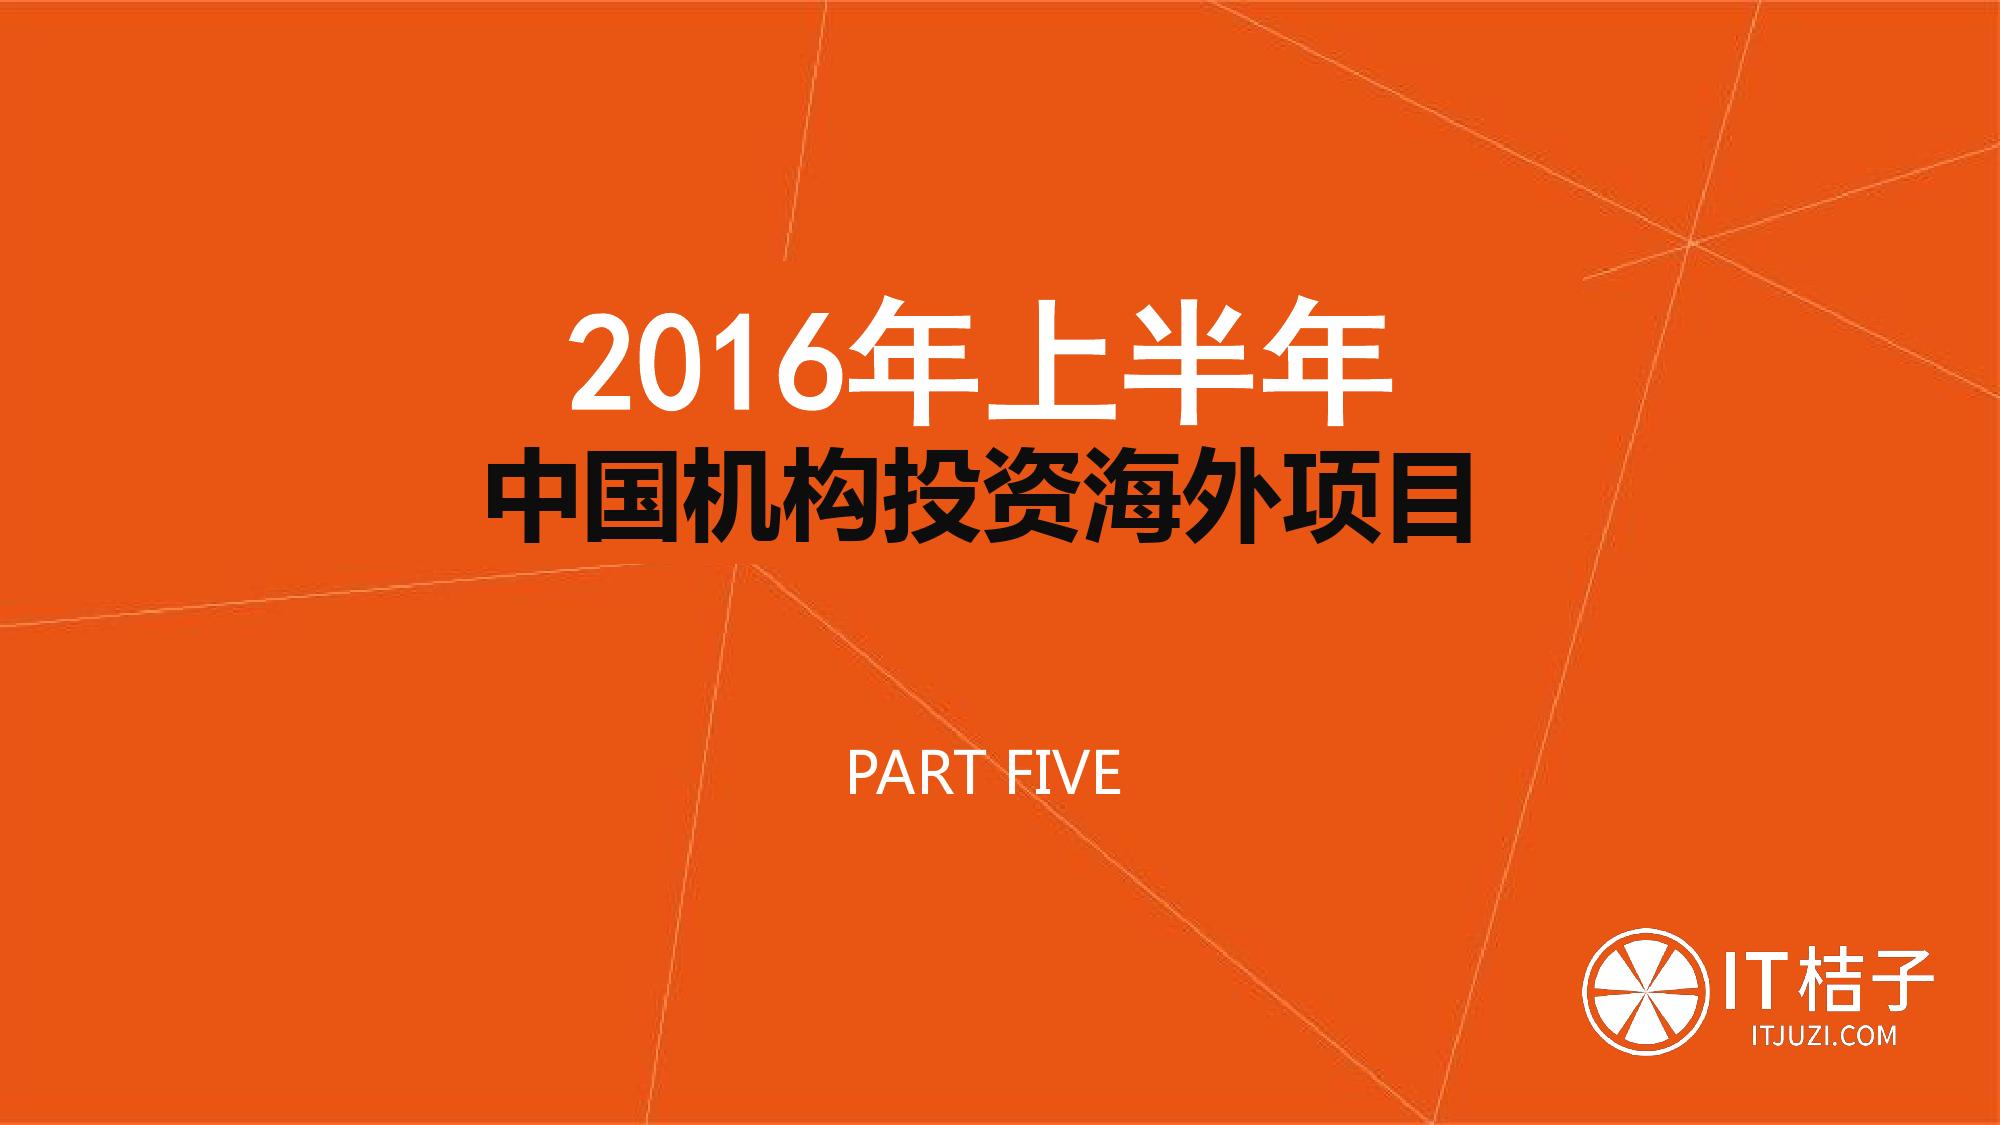 【IT桔子】2016年Q2中国互联网创业投资分析报告_000046